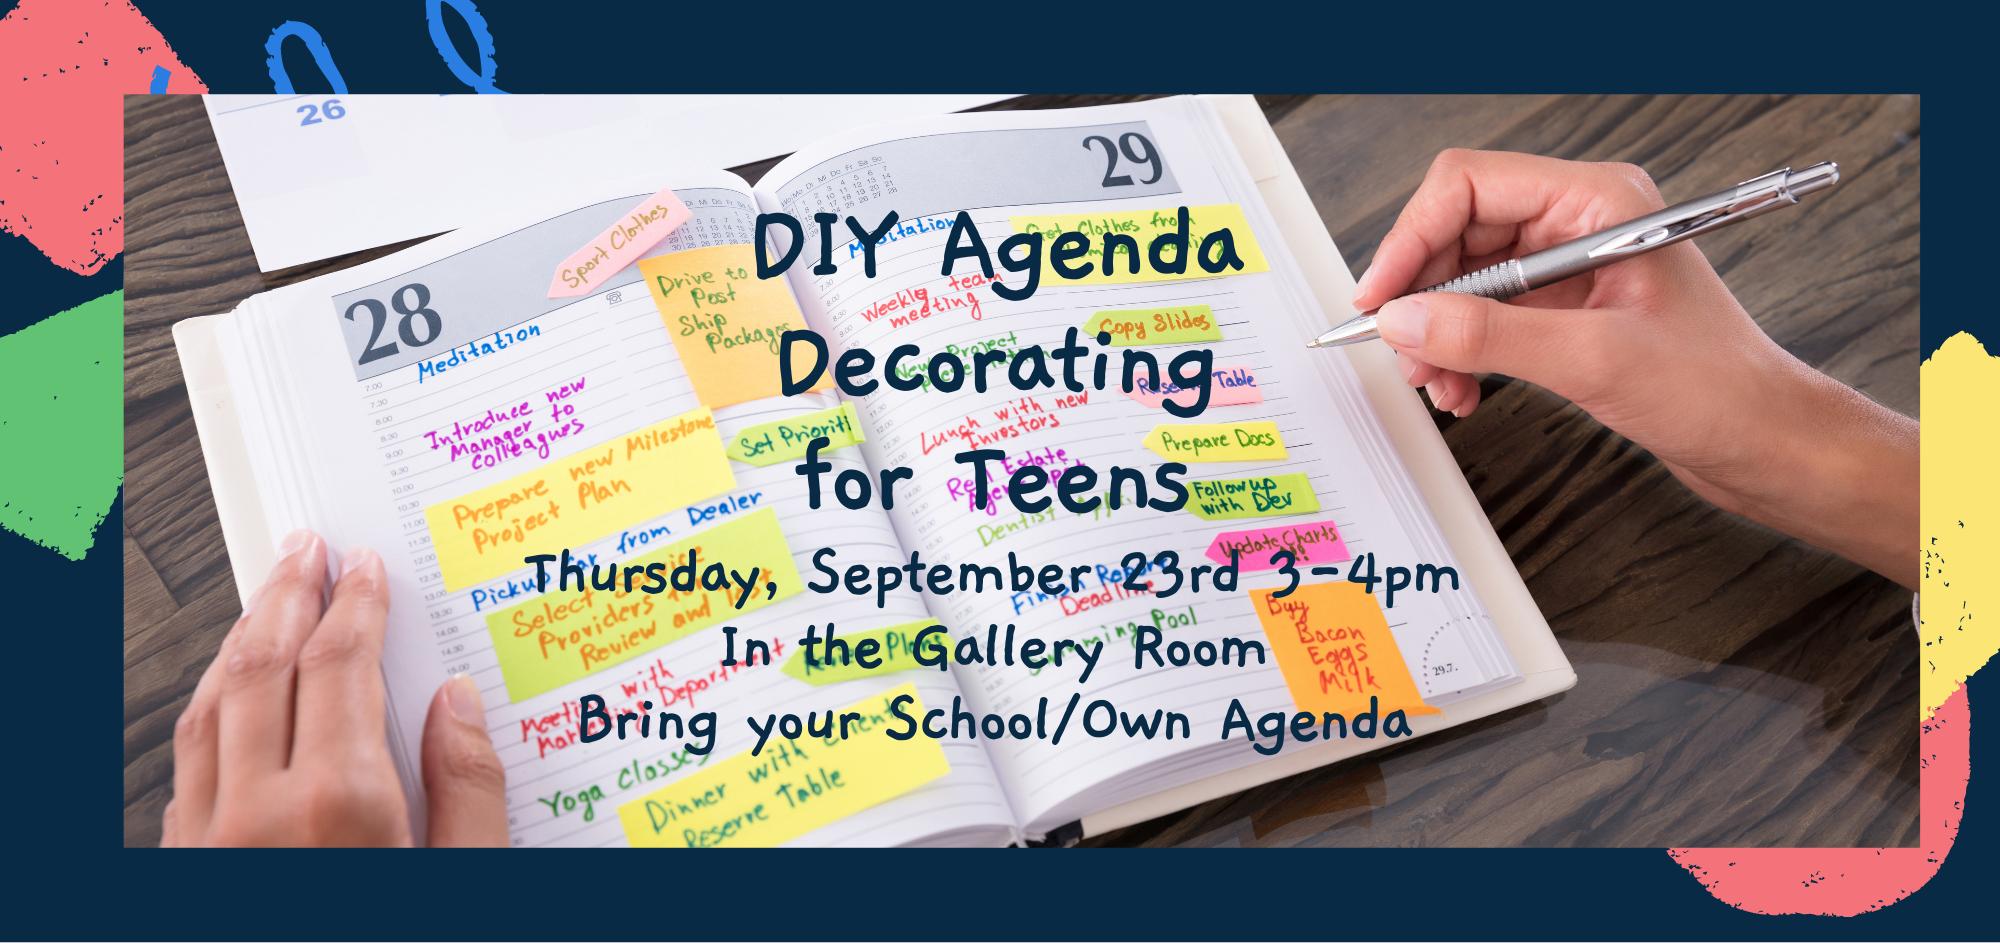 Agenda DIY Decorating